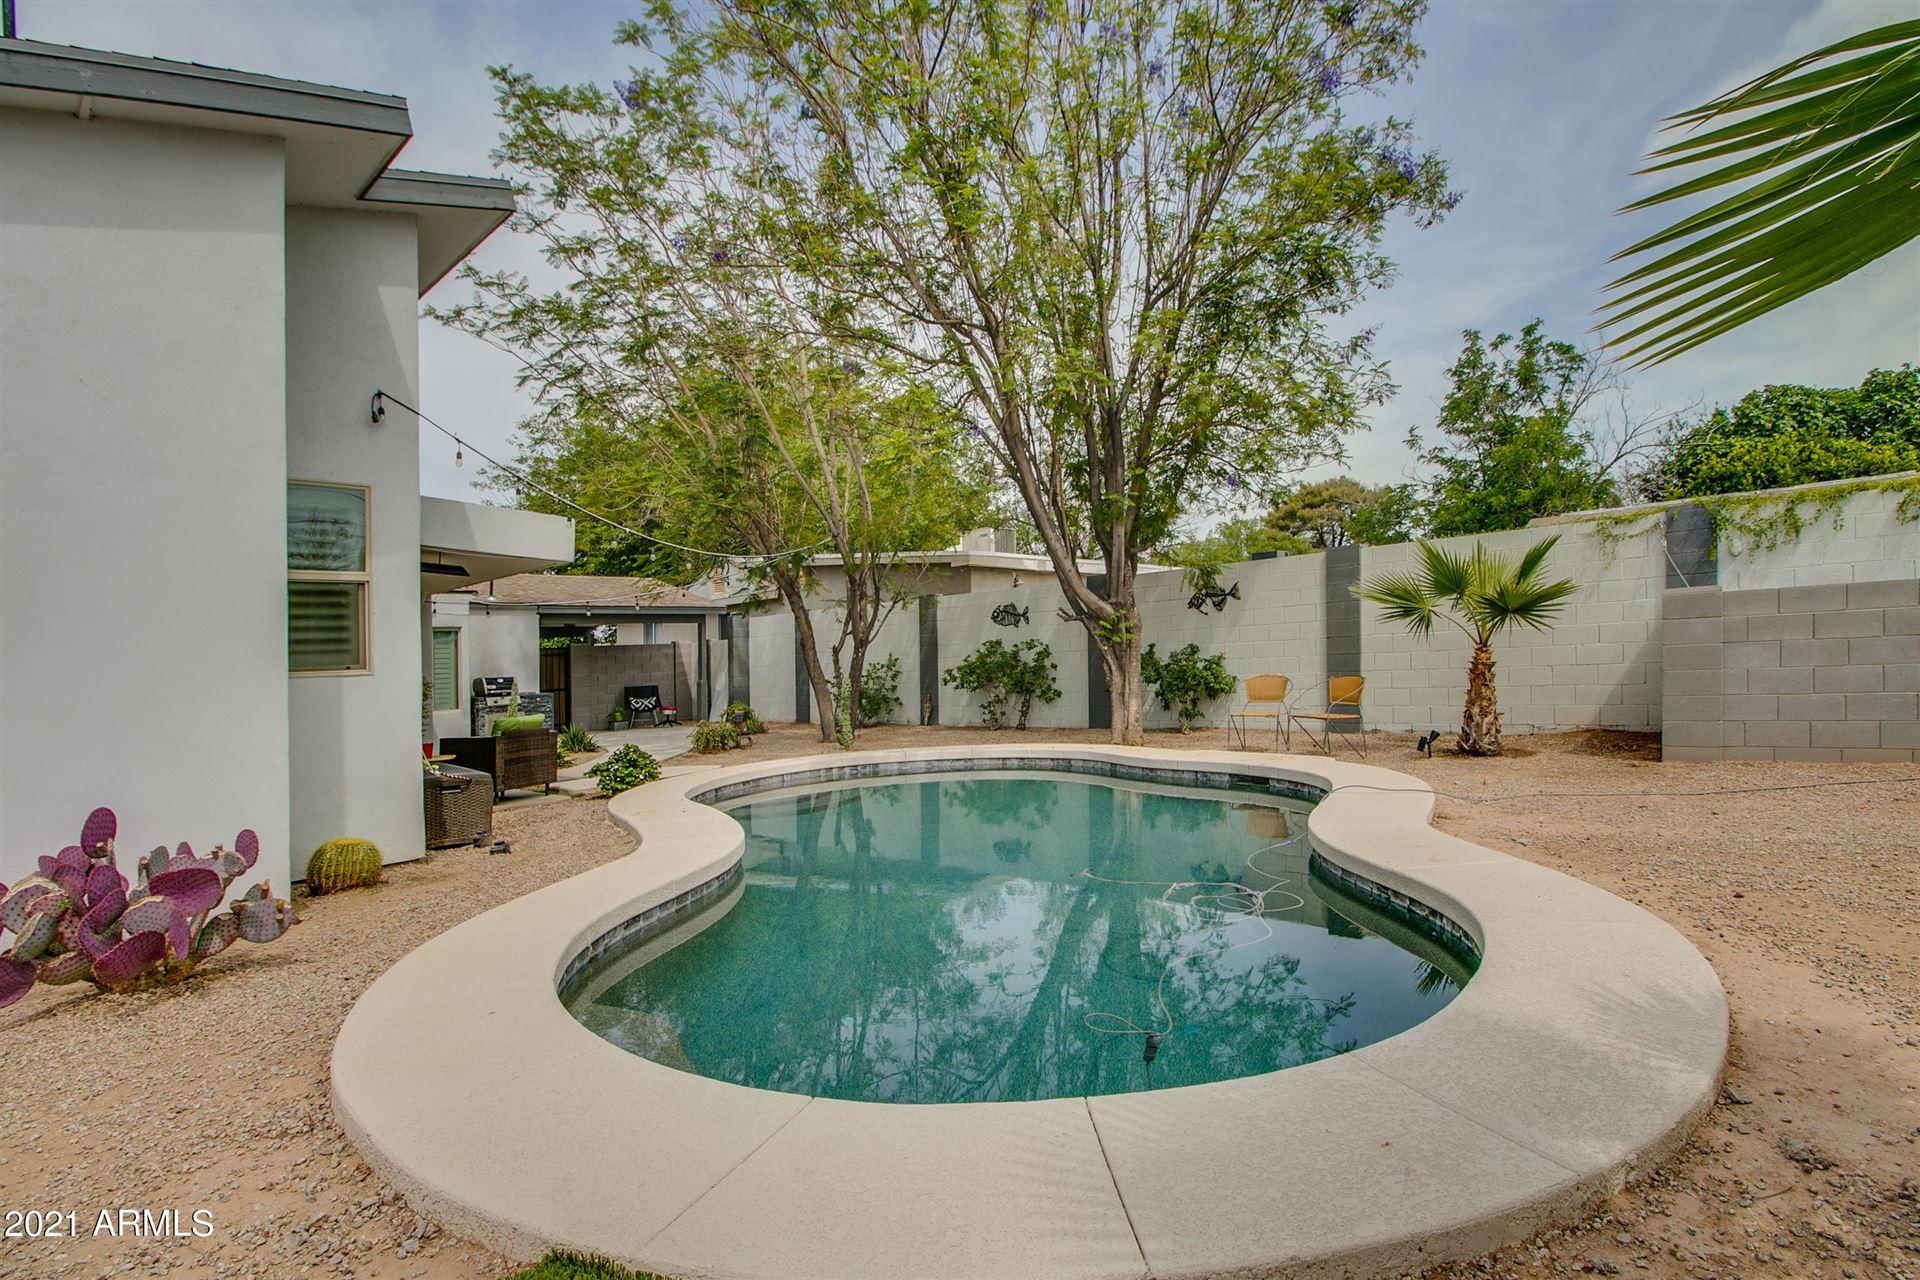 4209 N 19TH Street, Phoenix, AZ 85016 - MLS#: 6226822